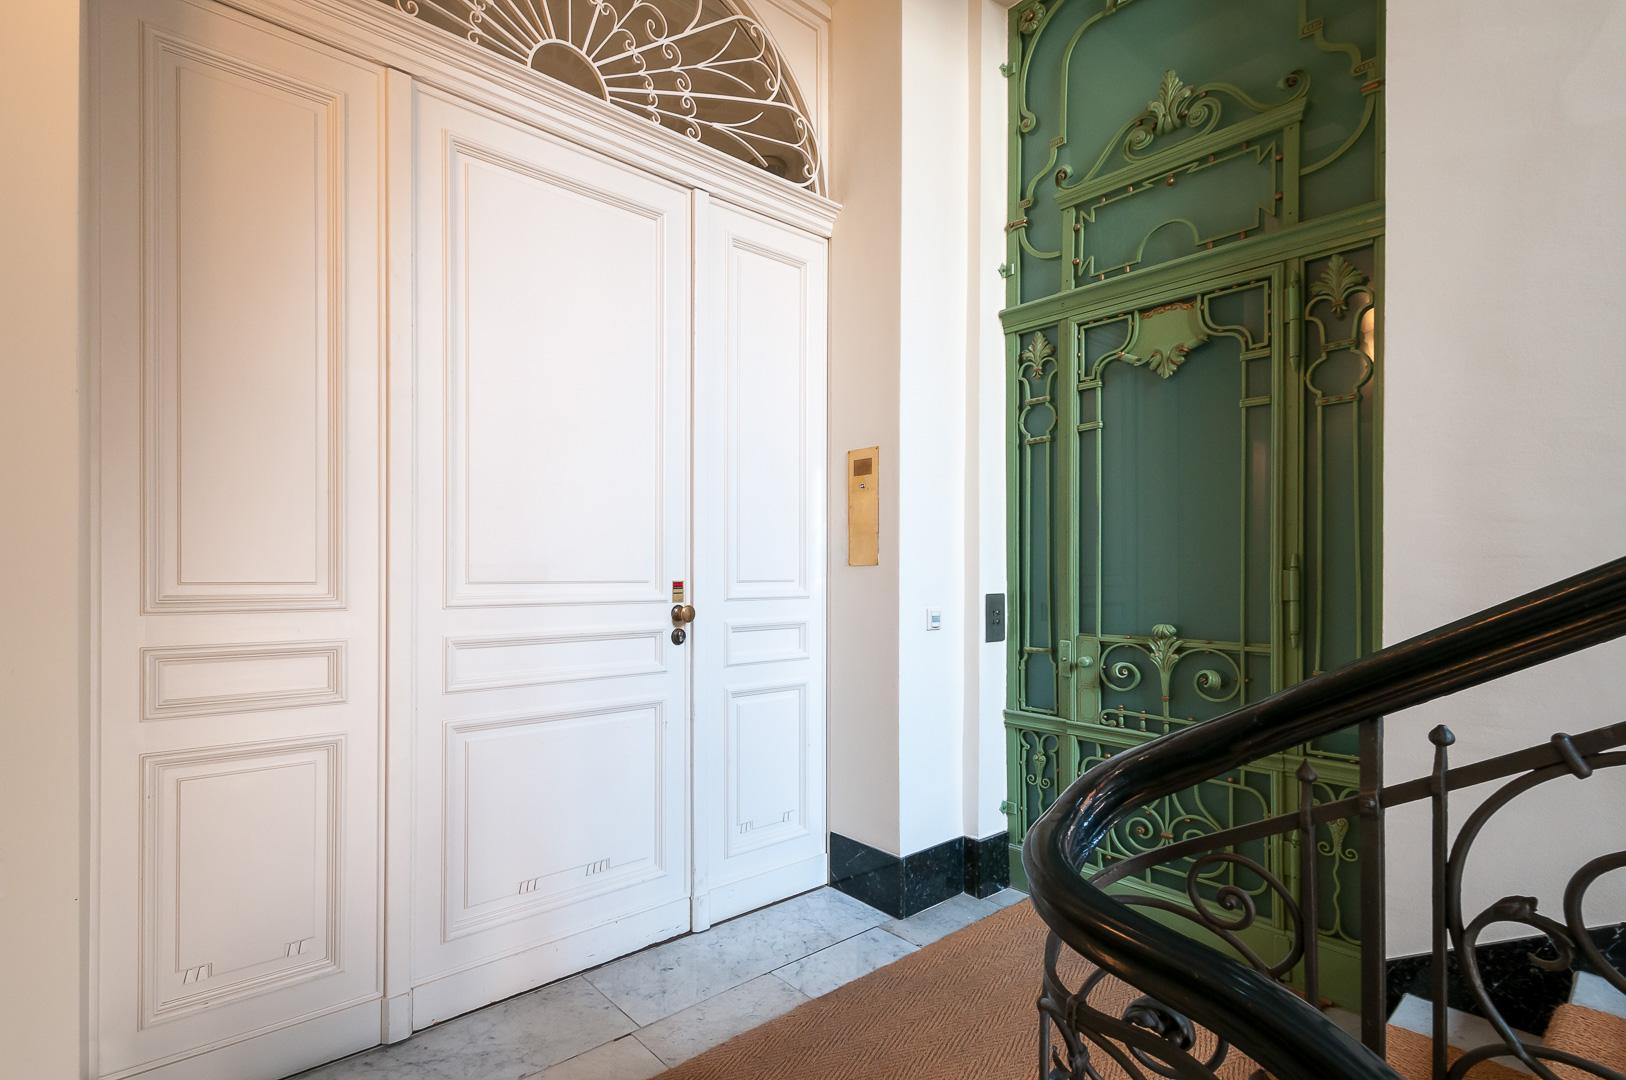 Treppenhaus, Fahrstuhl, Eingang